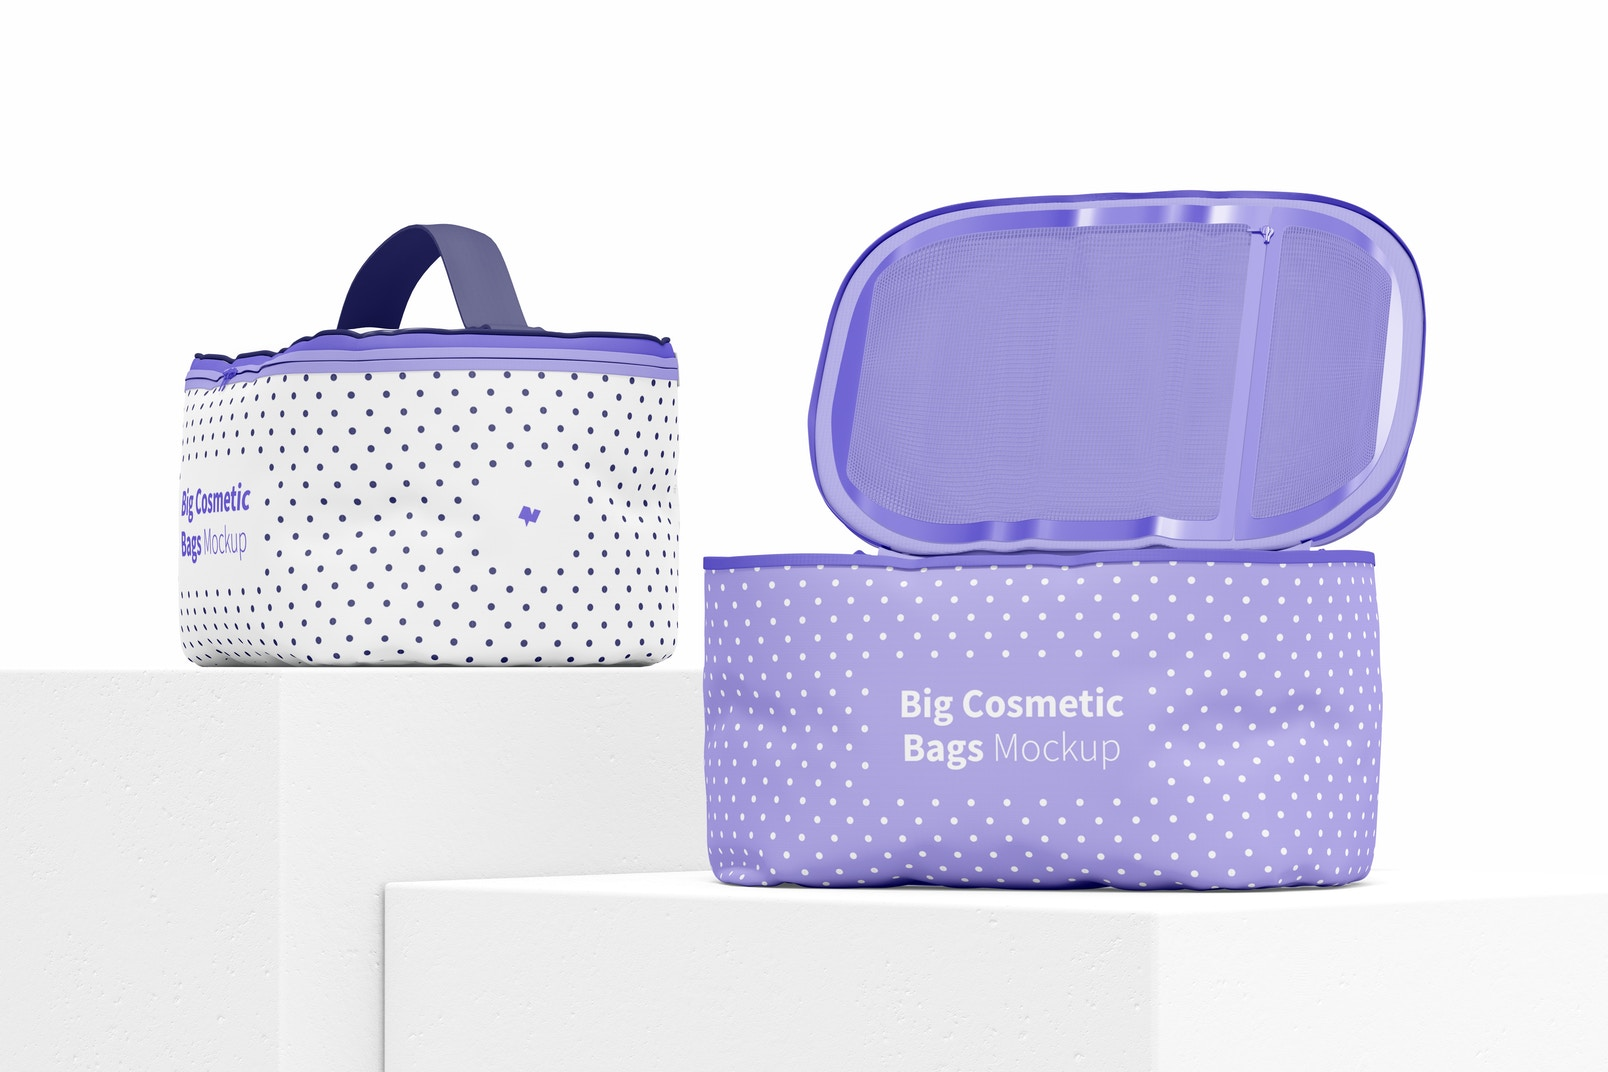 Big Cosmetic Bags Mockup, Perspective